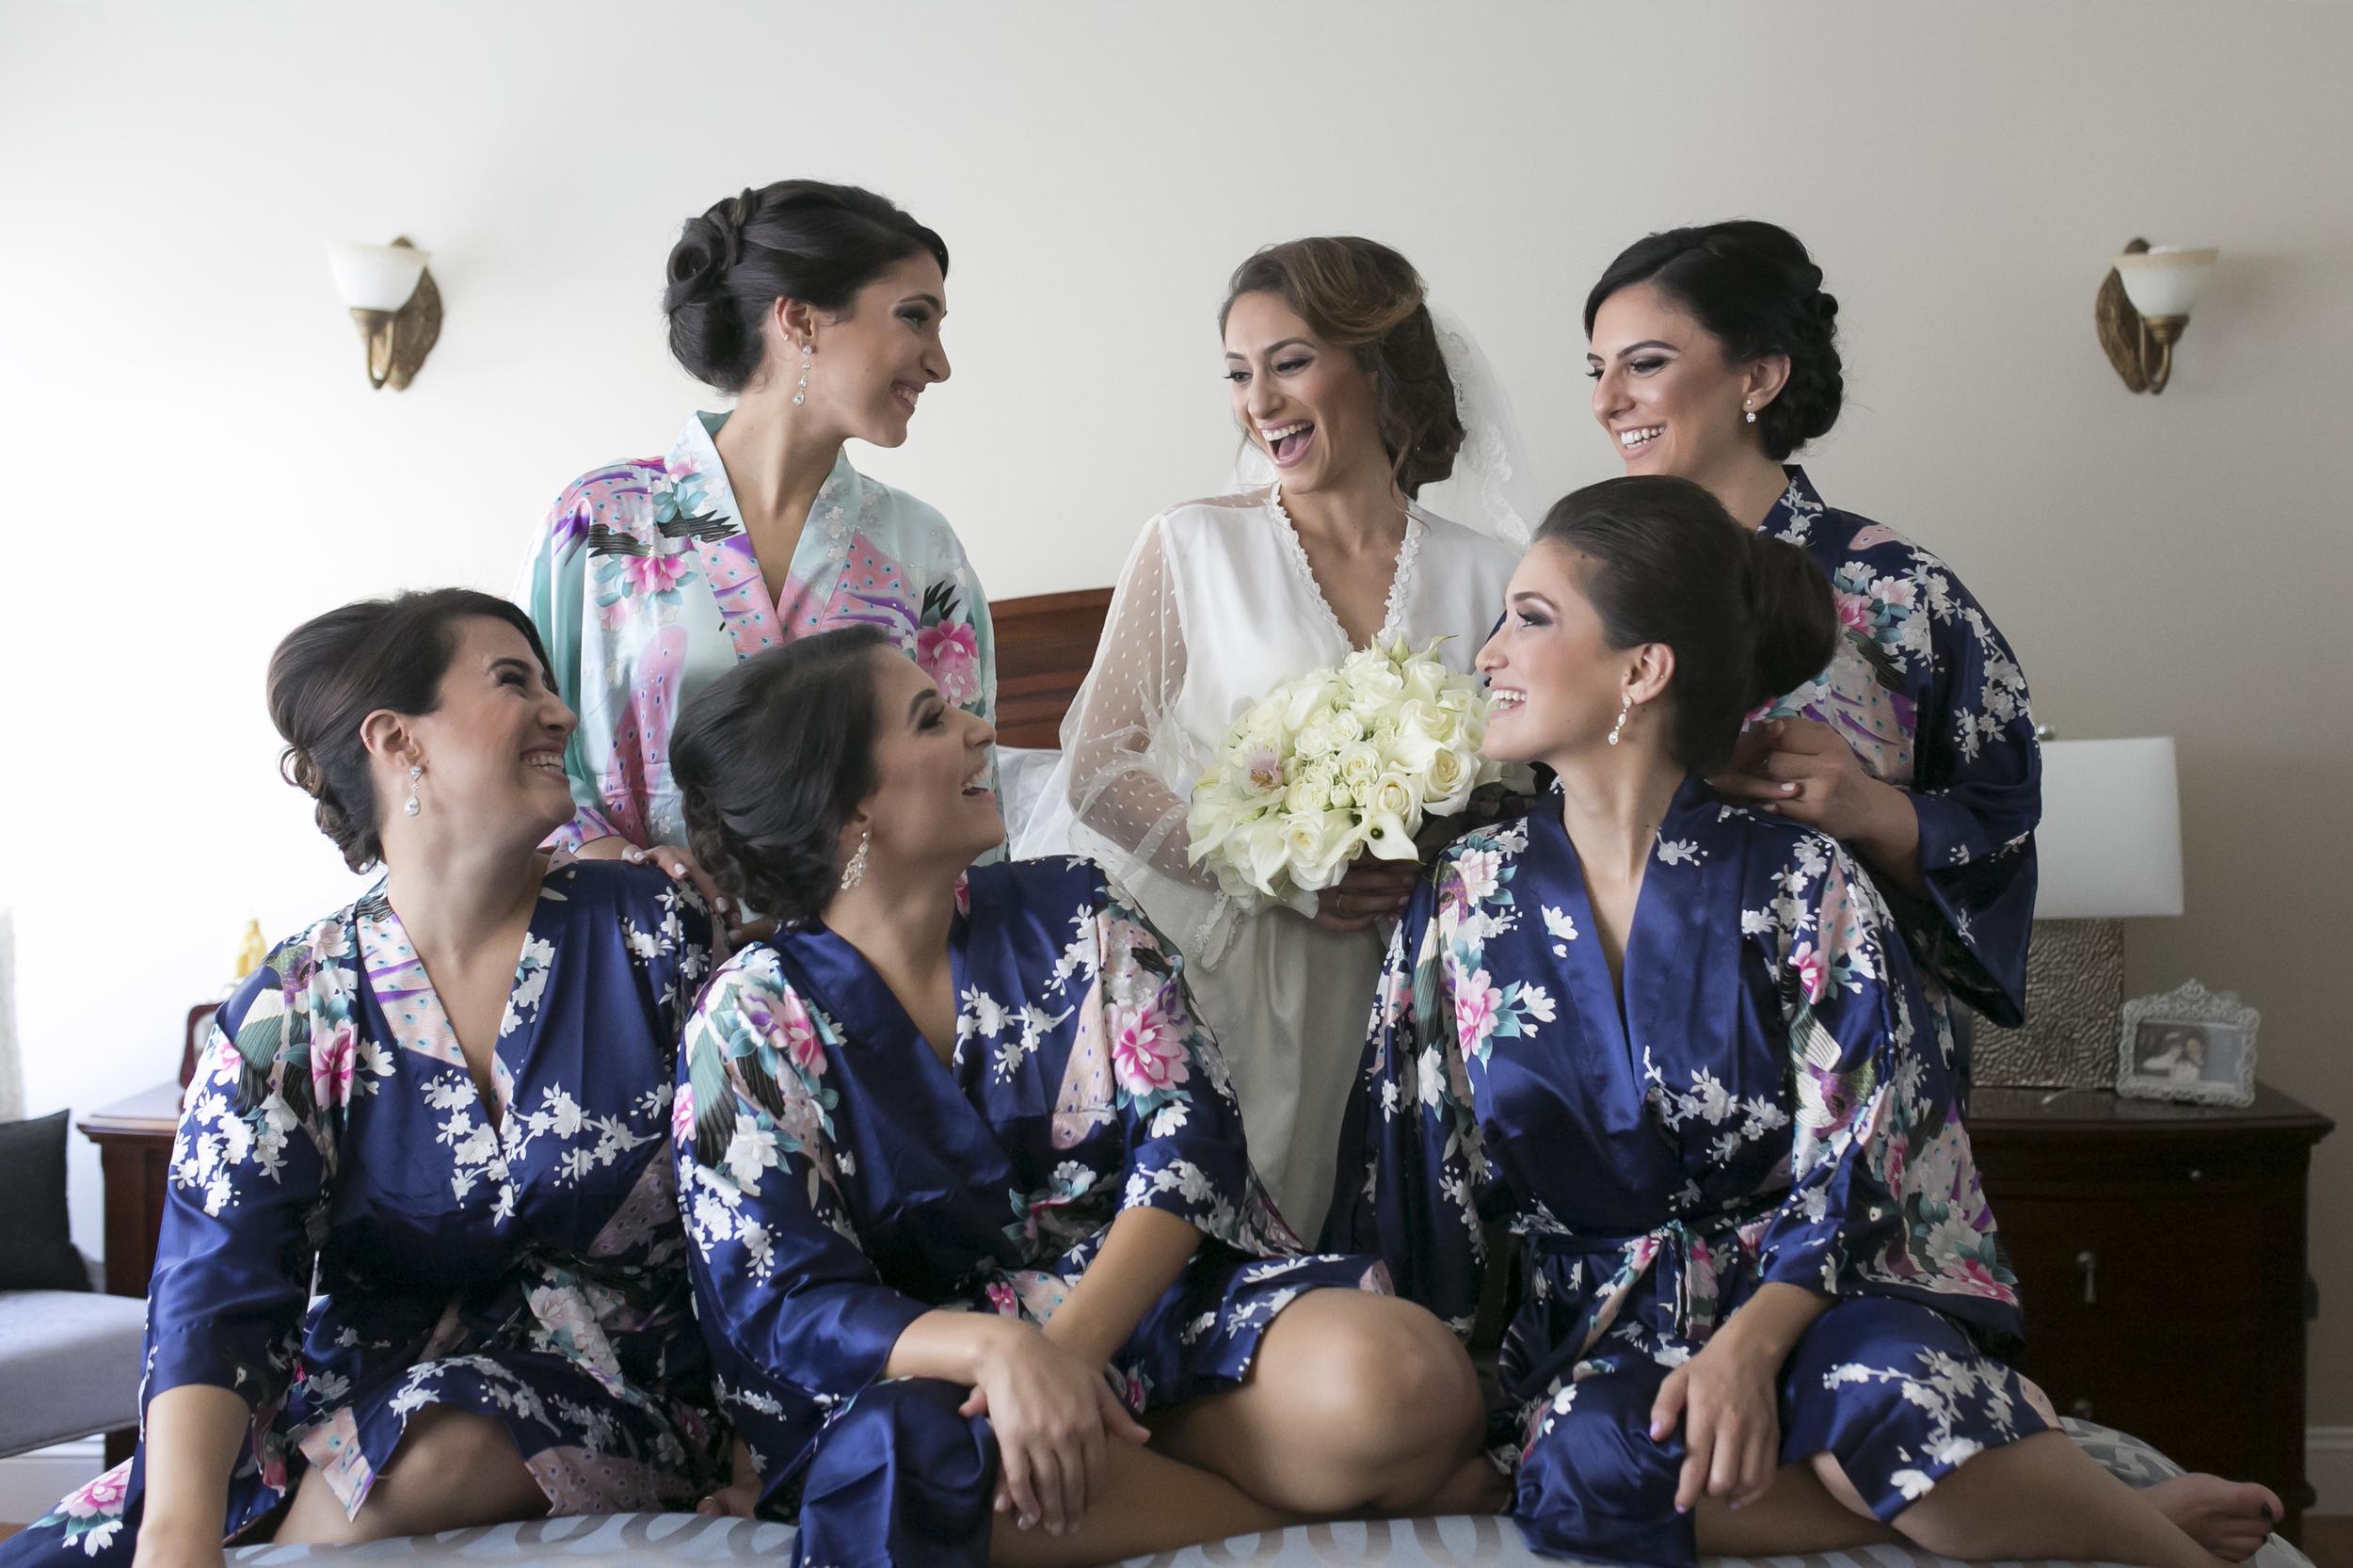 Persian Wedding-South San Francisco-Meo Baaklini15.jpg